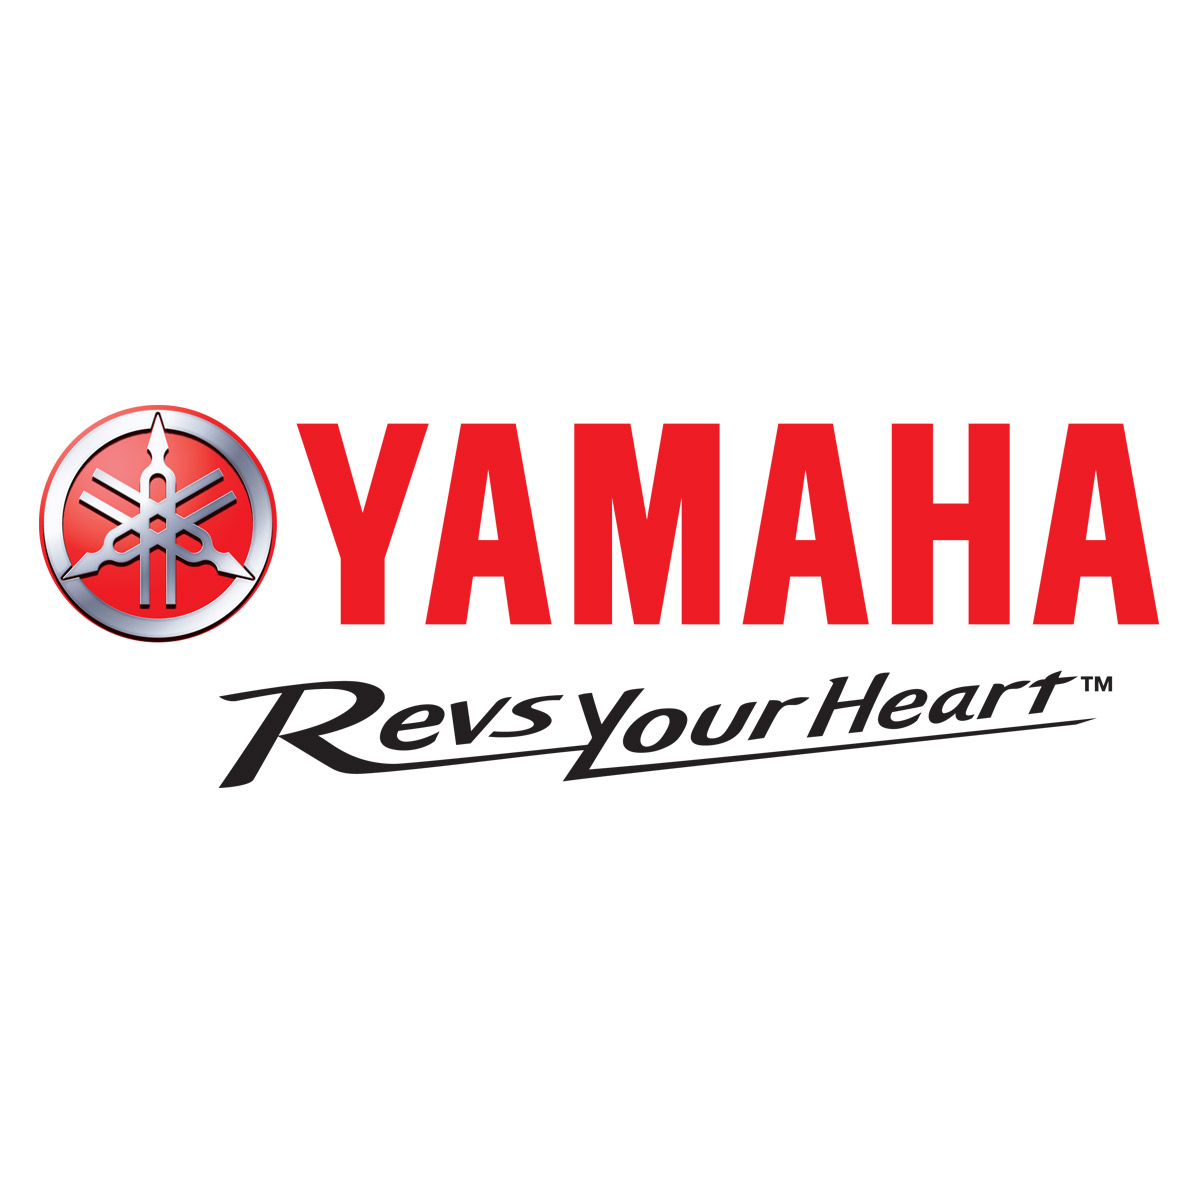 ATVs, Motorcycles, Generators, Side-by-Sides, Snowmobiles - Yamaha Motor  Corp, USA - Yamaha PNG